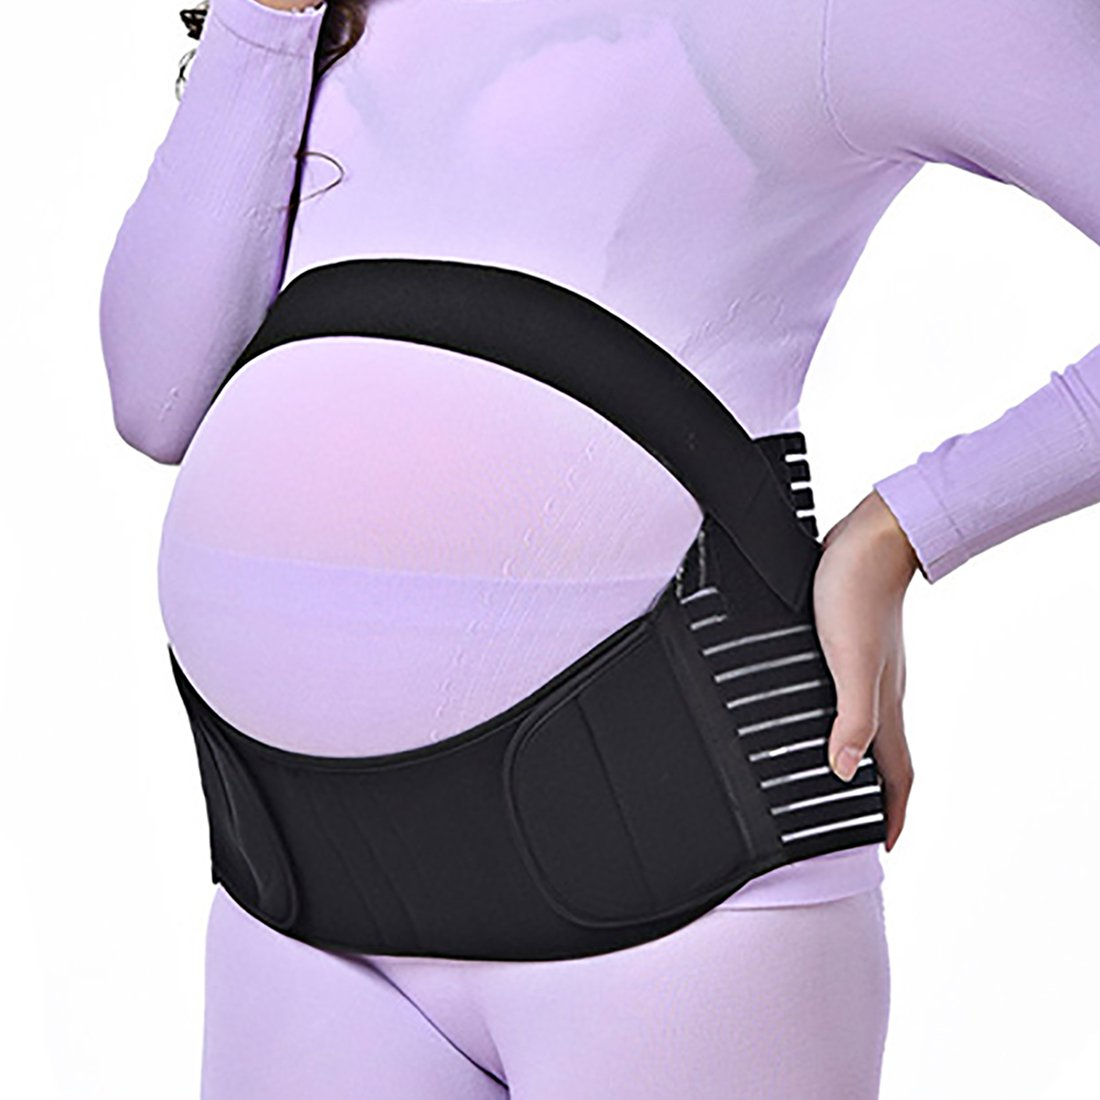 Hisret Maternity Belly Support Belt Pregnancy Waist Back Abdomen Band Adjustable CHRAA0019-0022-01